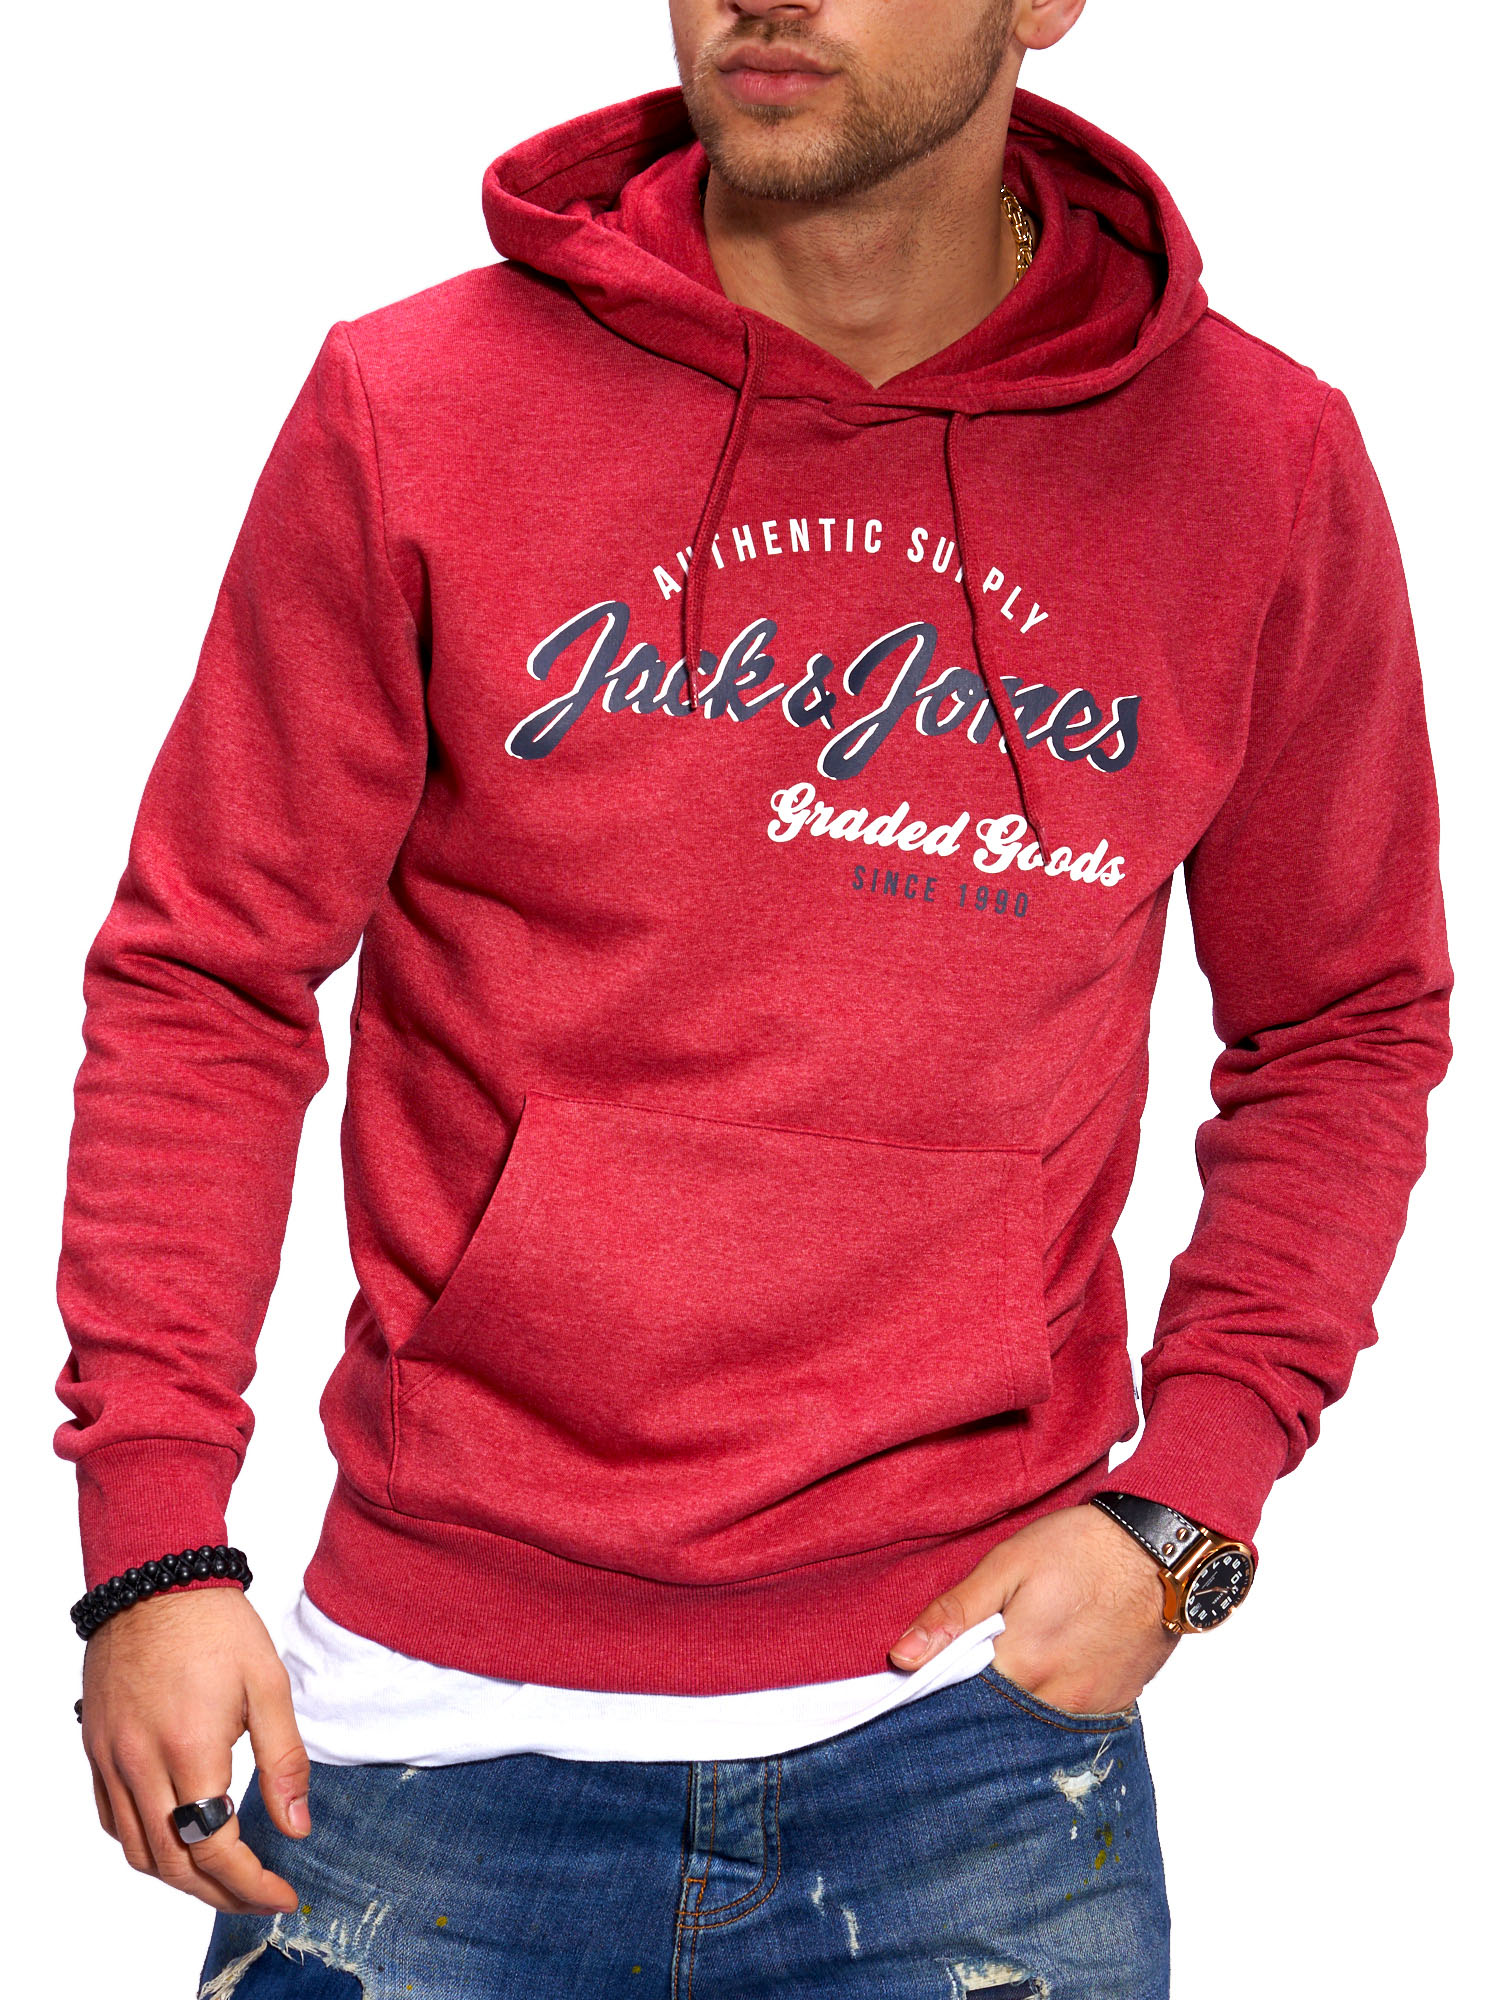 Jack-amp-Jones-senores-Hoodie-sudaderas-con-Print-Sweater-sueter-Streetwear miniatura 9